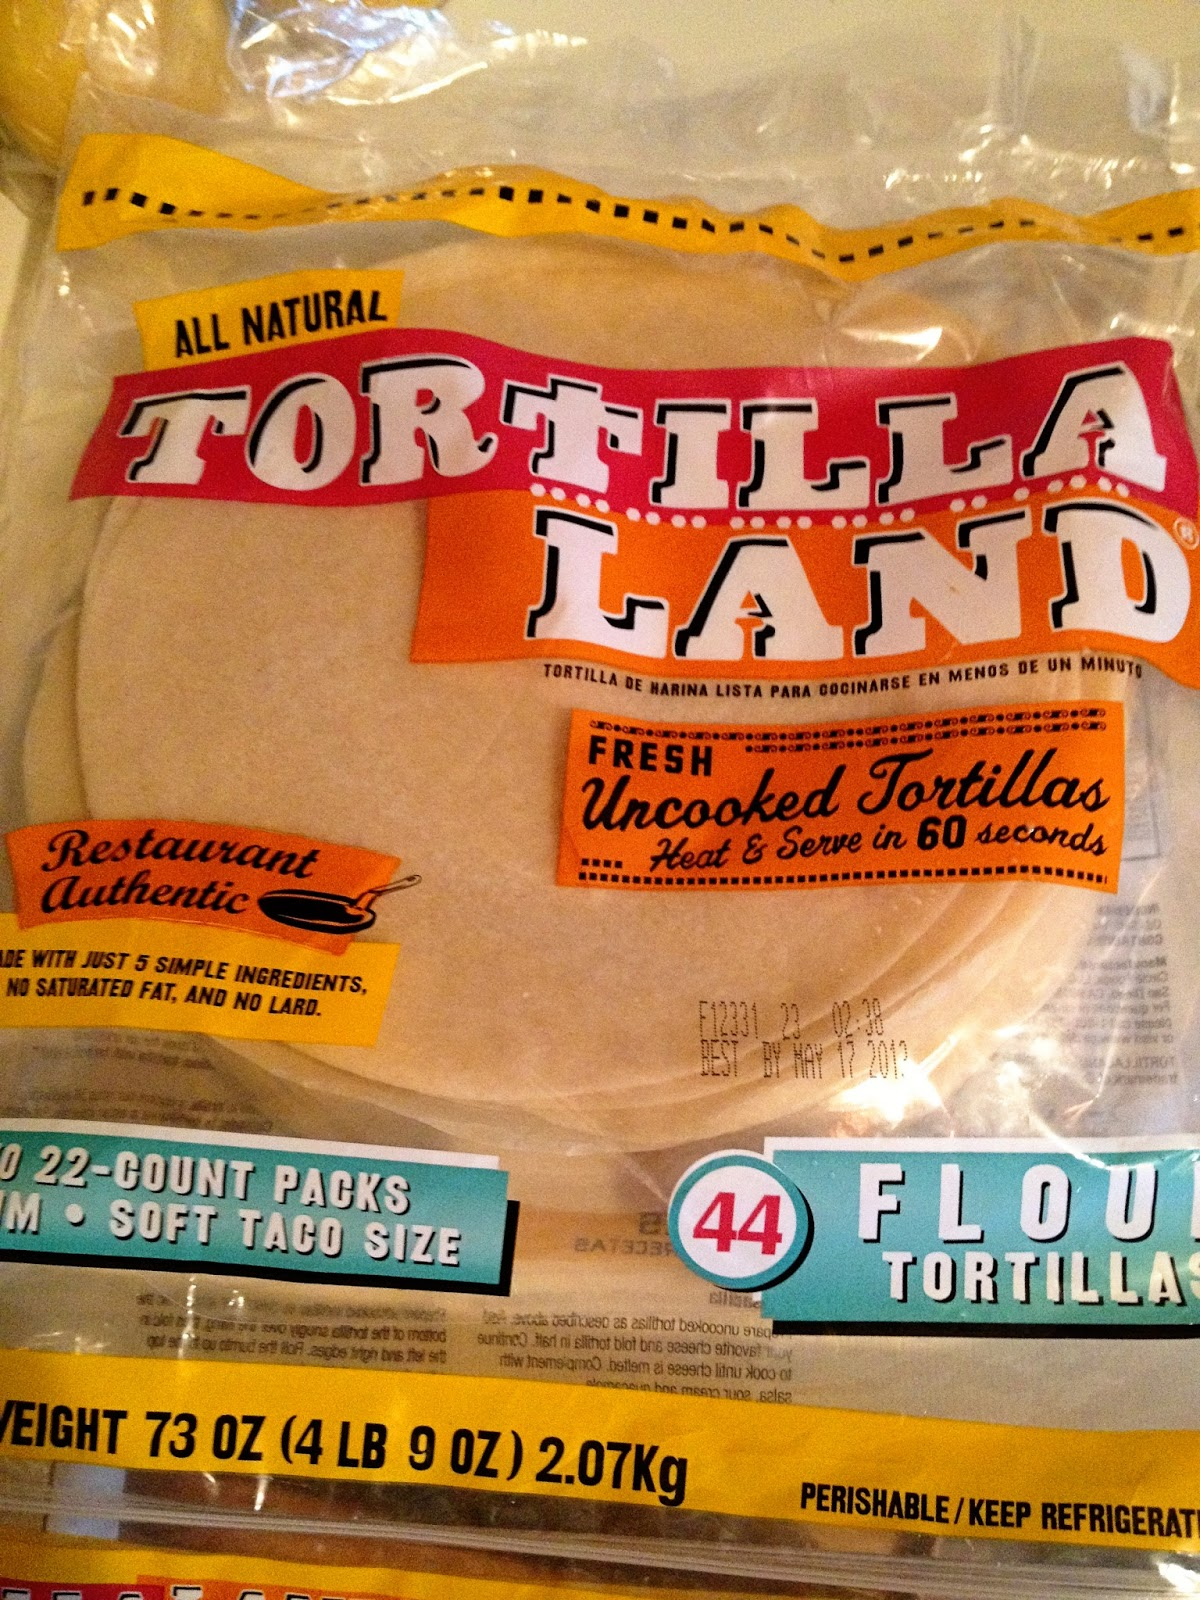 Good eats raw tortillas tortilla land from costco for Costco raw dog food